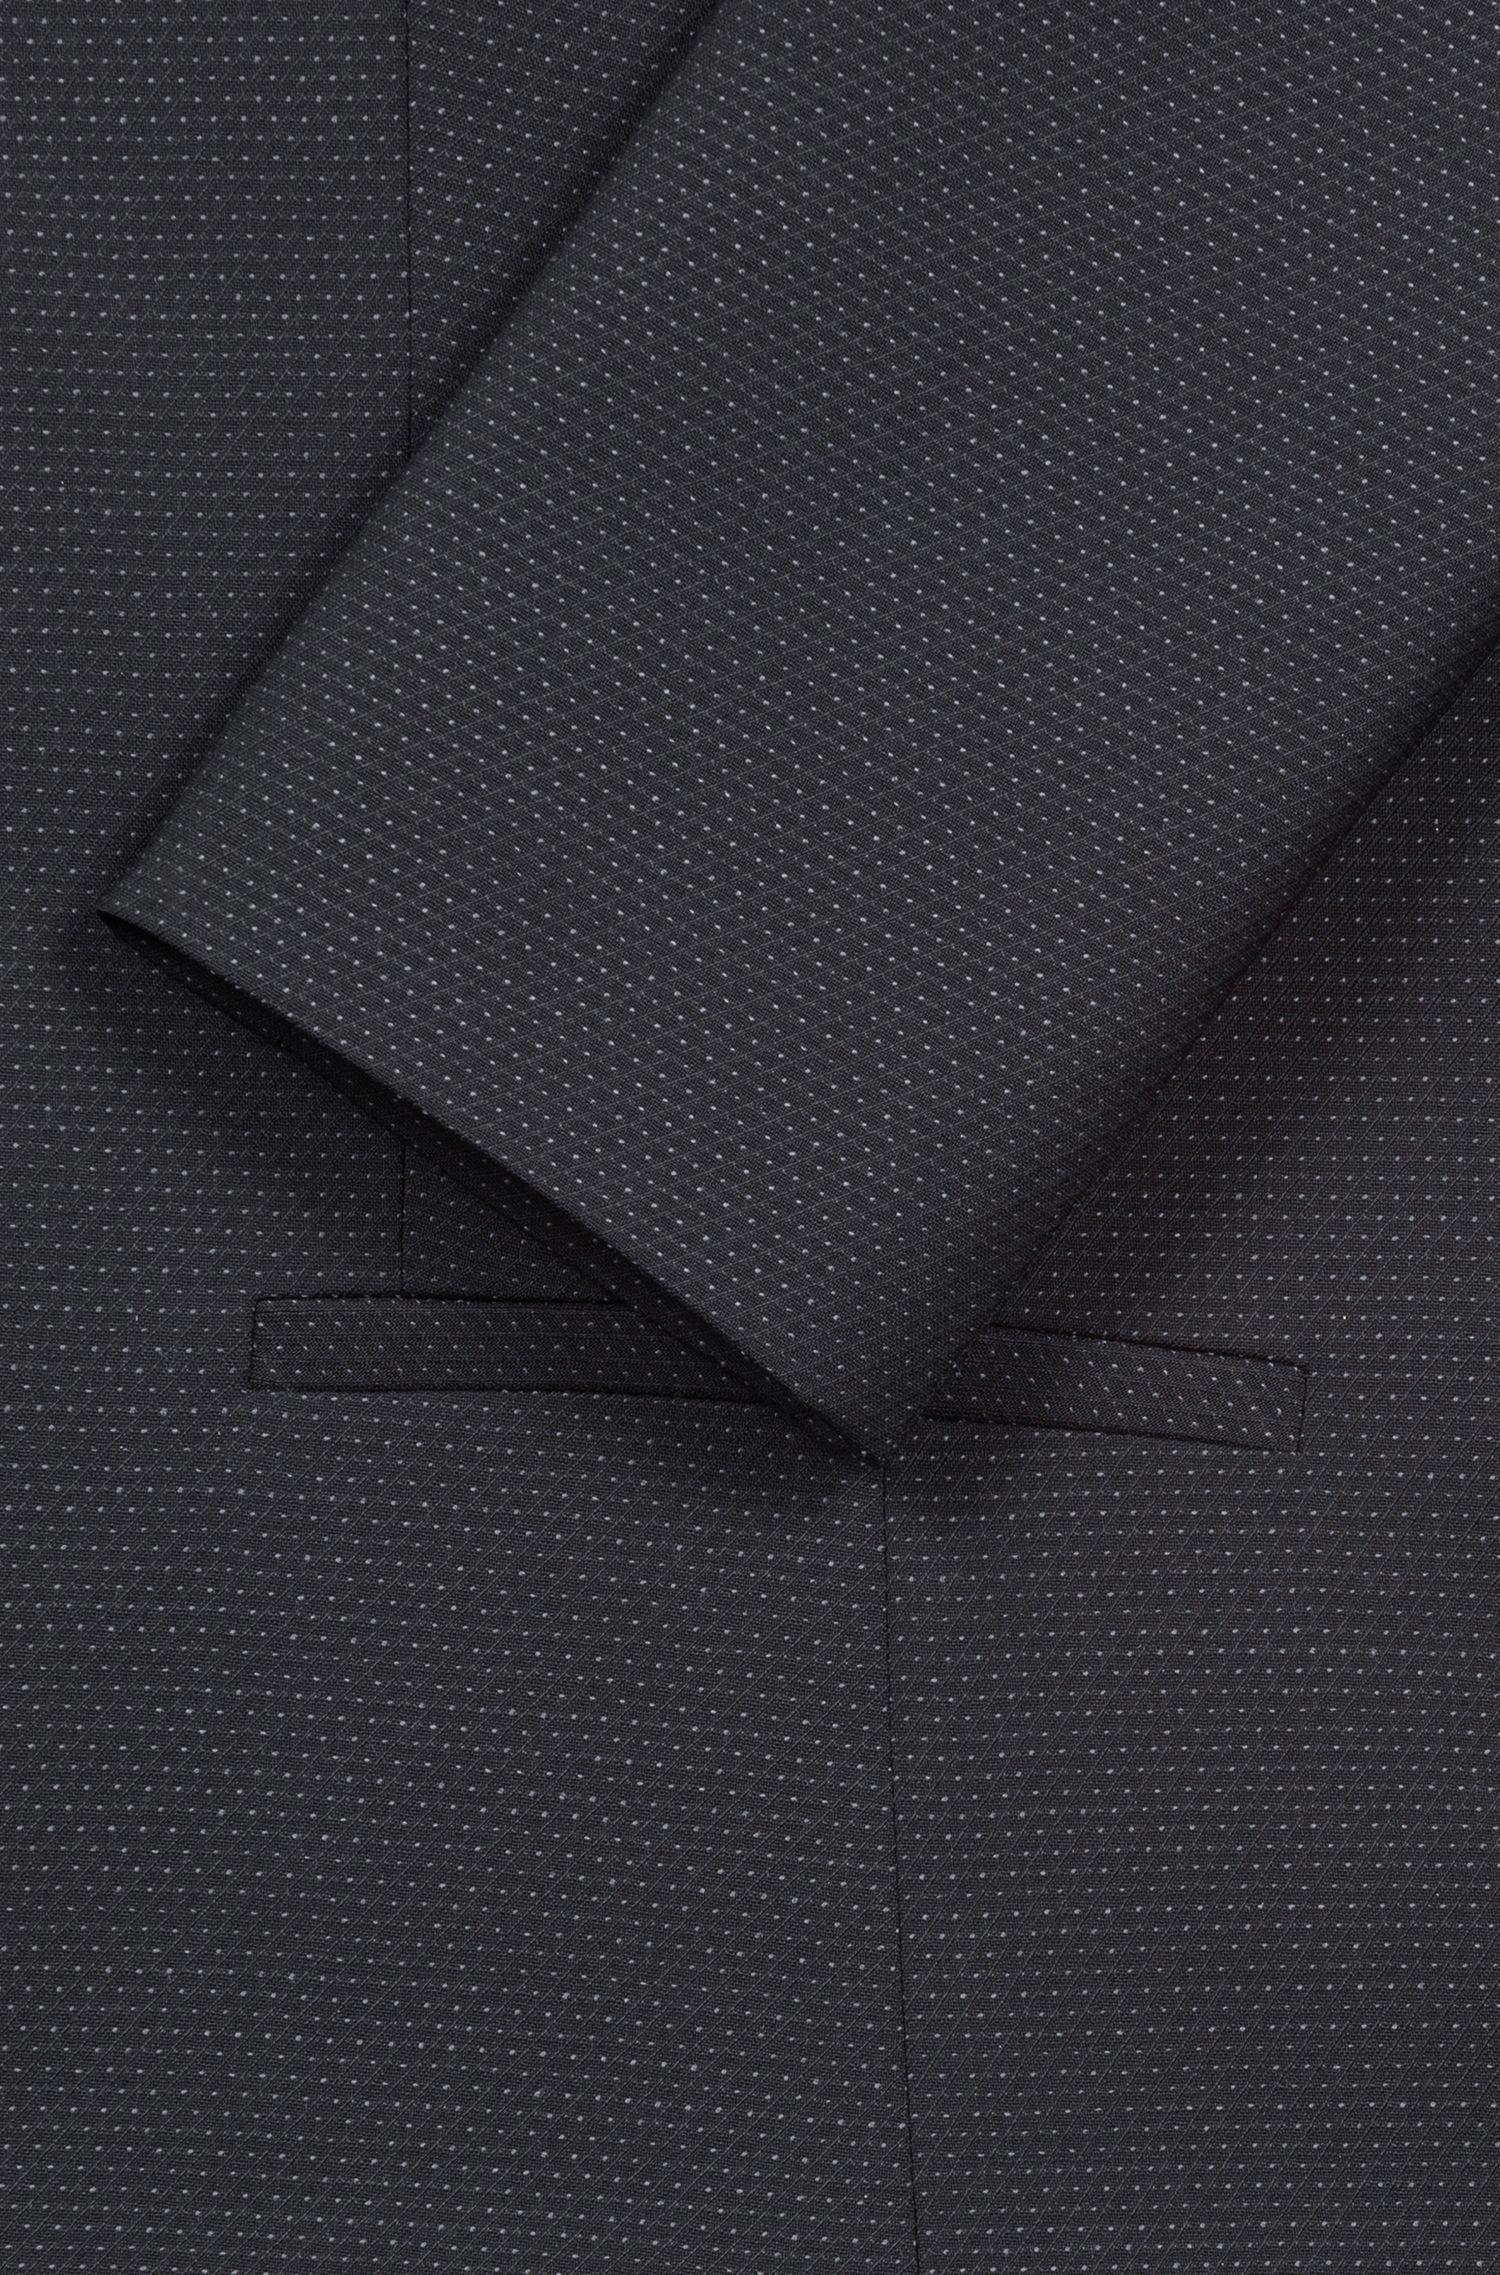 Regular-fit jacket in a micro-pattern wool blend, Black